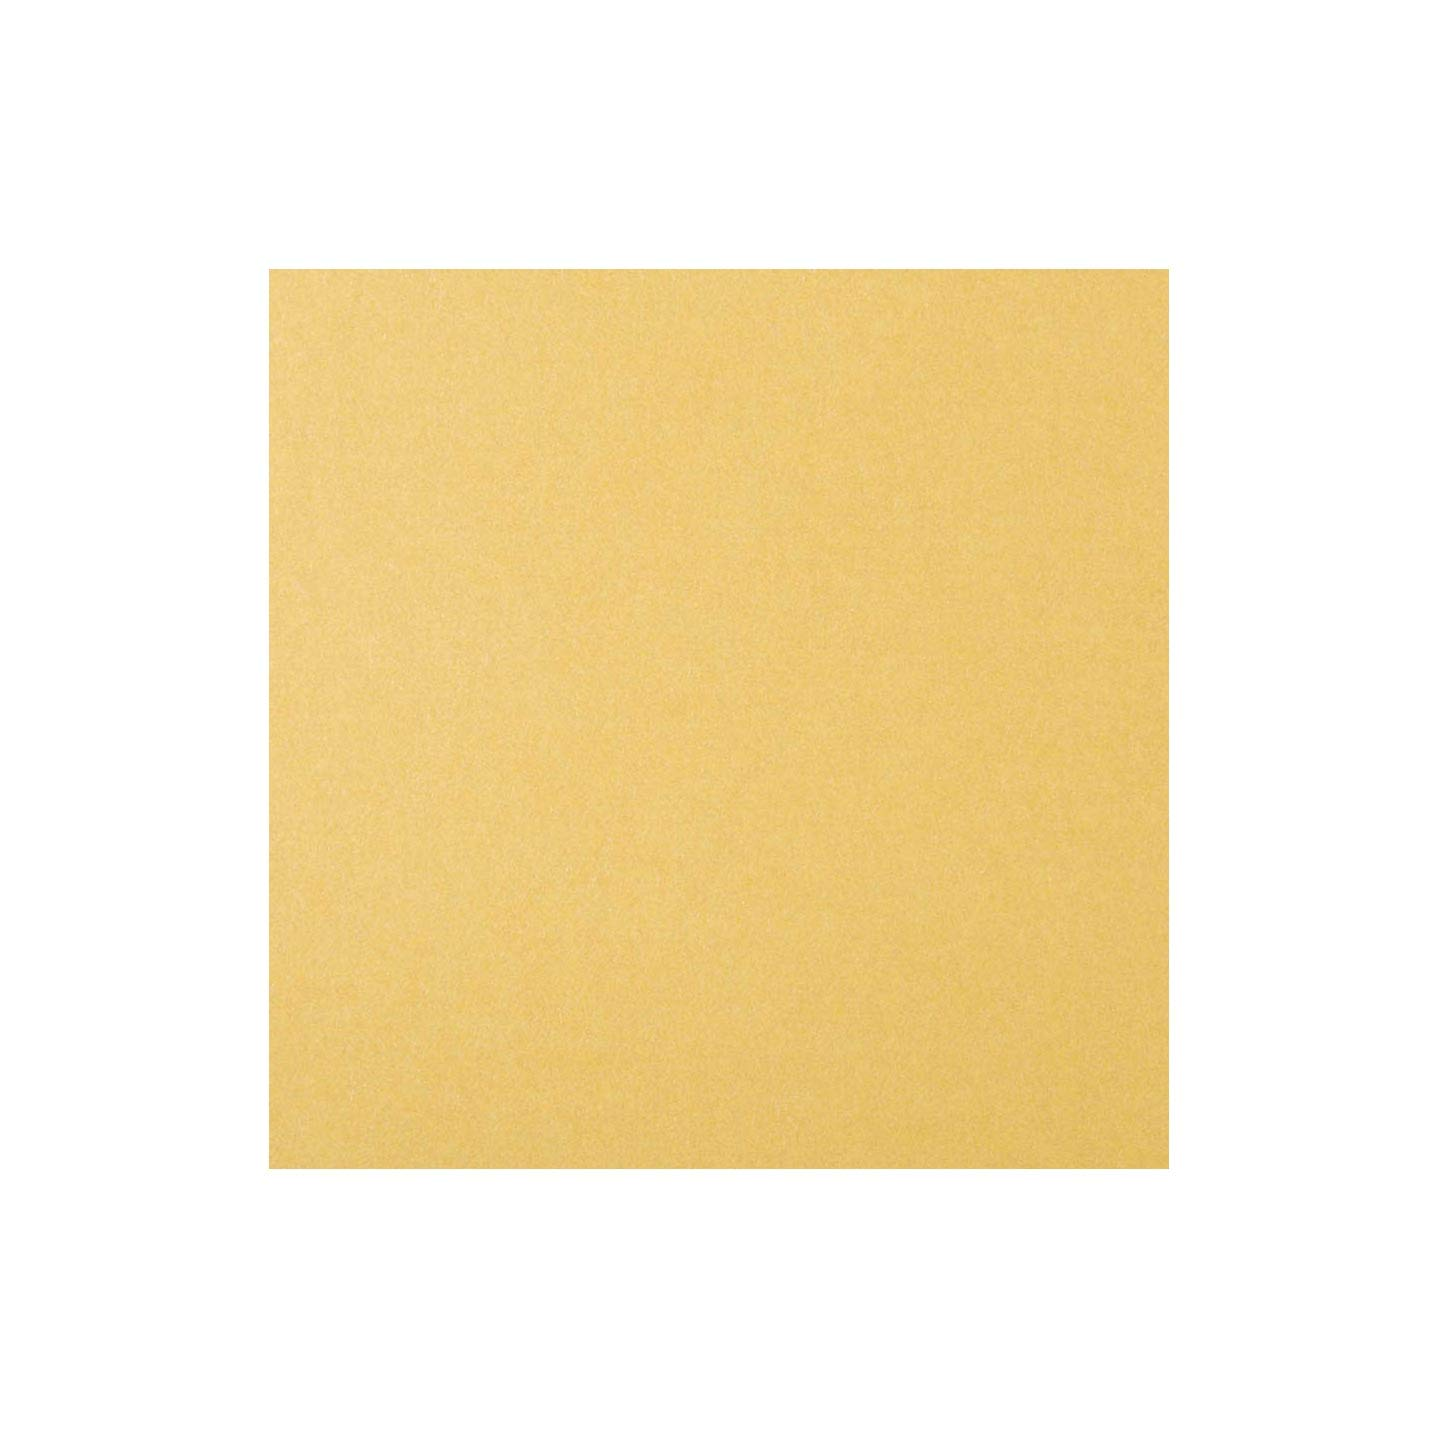 Bulk Buy: Darice DIY Crafts Cardmaker Series Pearls Cardstock Sheet Golden 8.5 x 11 (25-Pack) GX-CF-118 by Darice B00KNAZ6L0